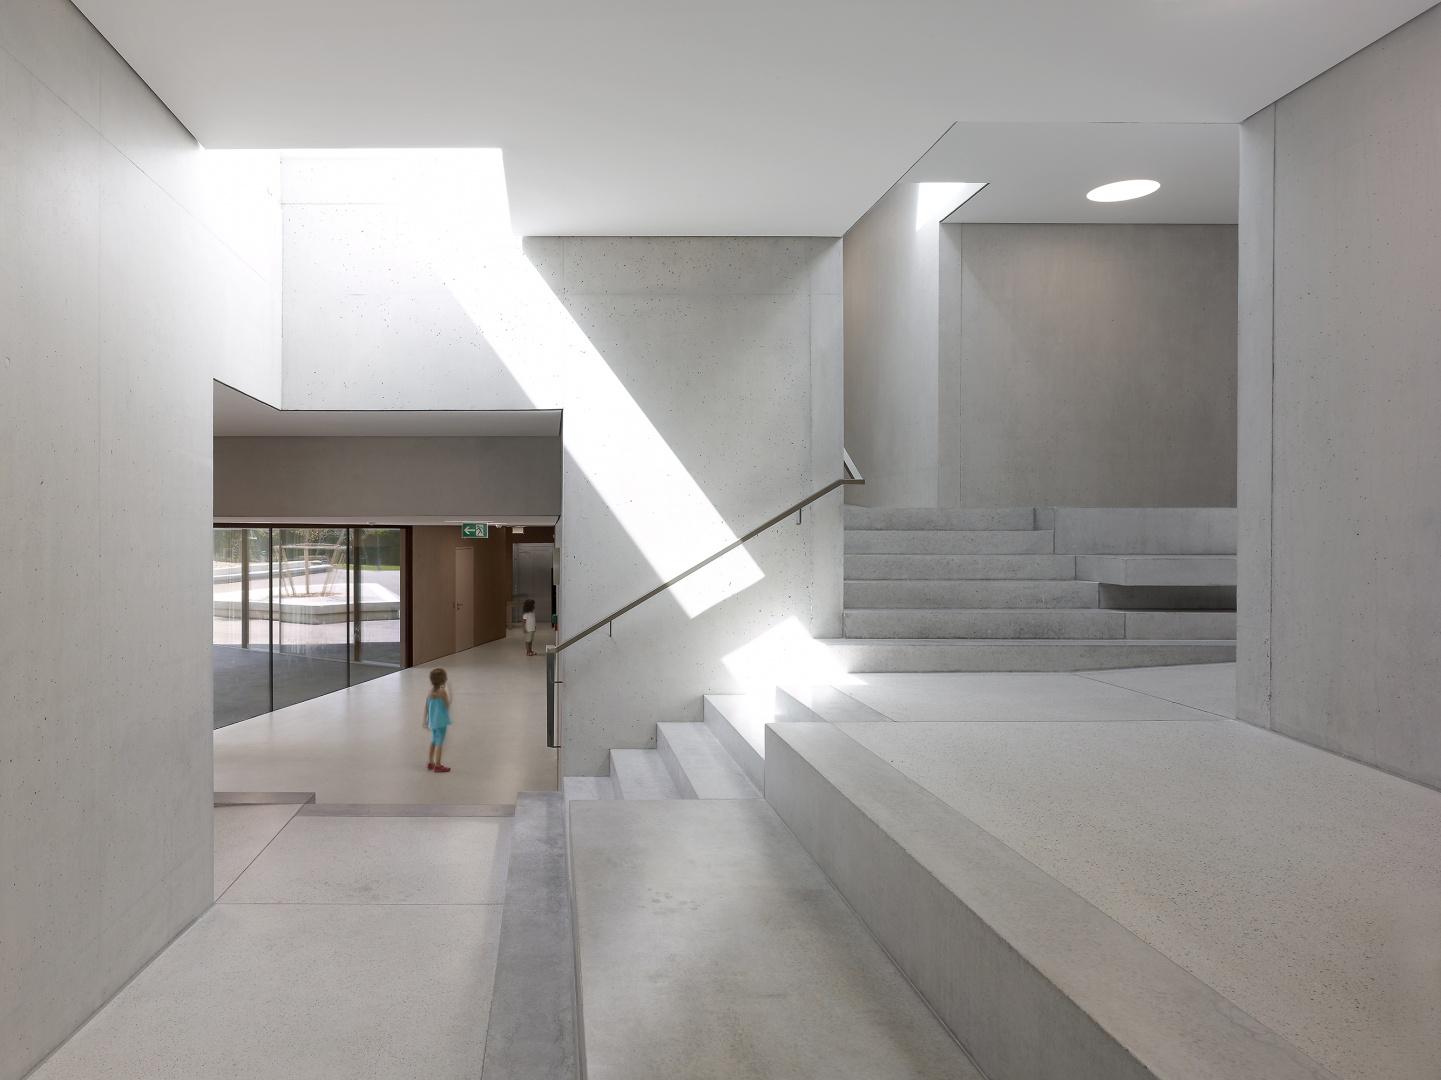 espace escalier central © Thomas Jantscher